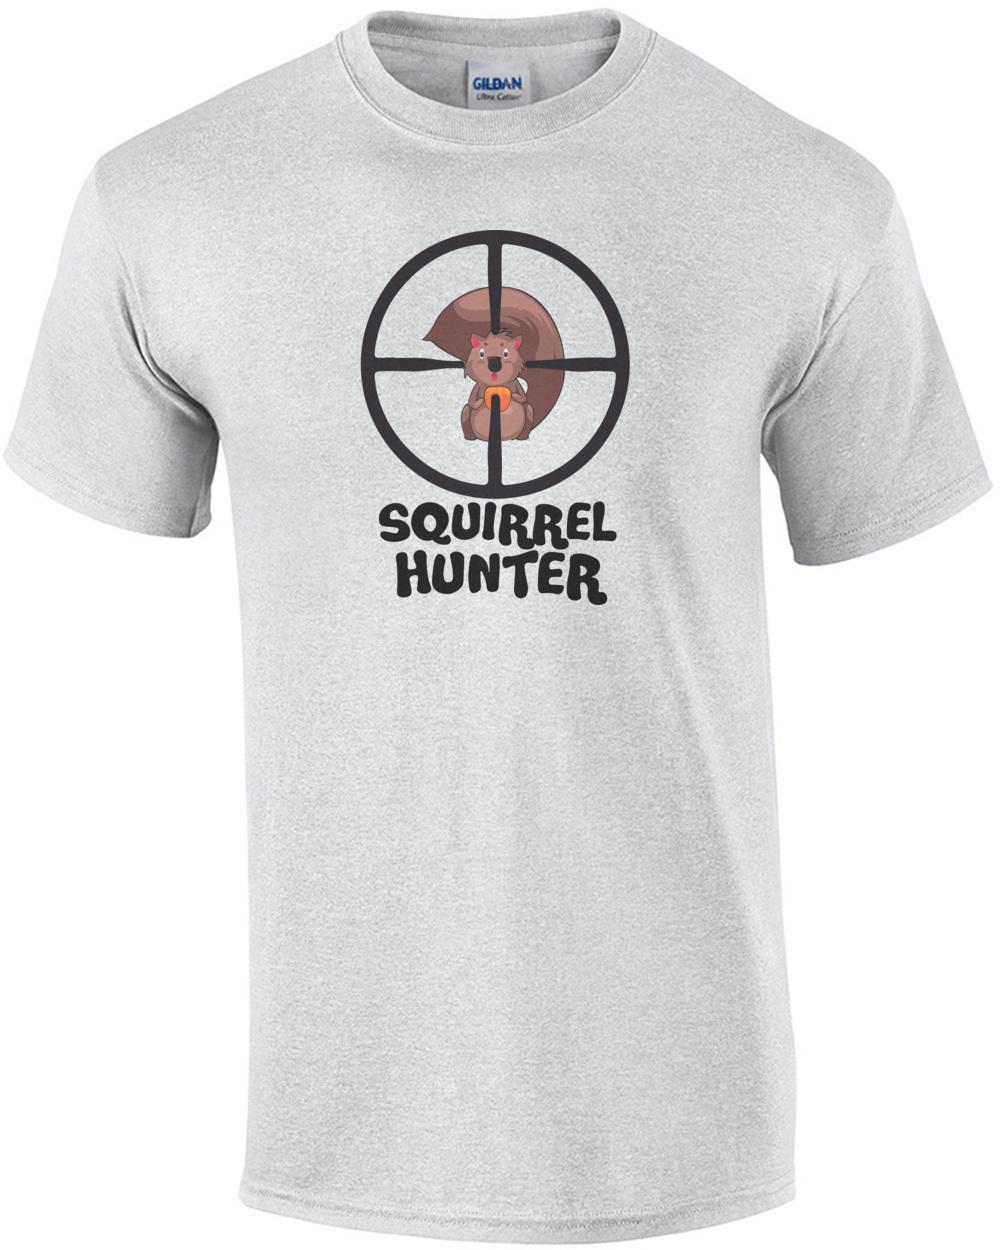 LightRed Funny Squirrel Shirt Mens Shirt Tee Shirt